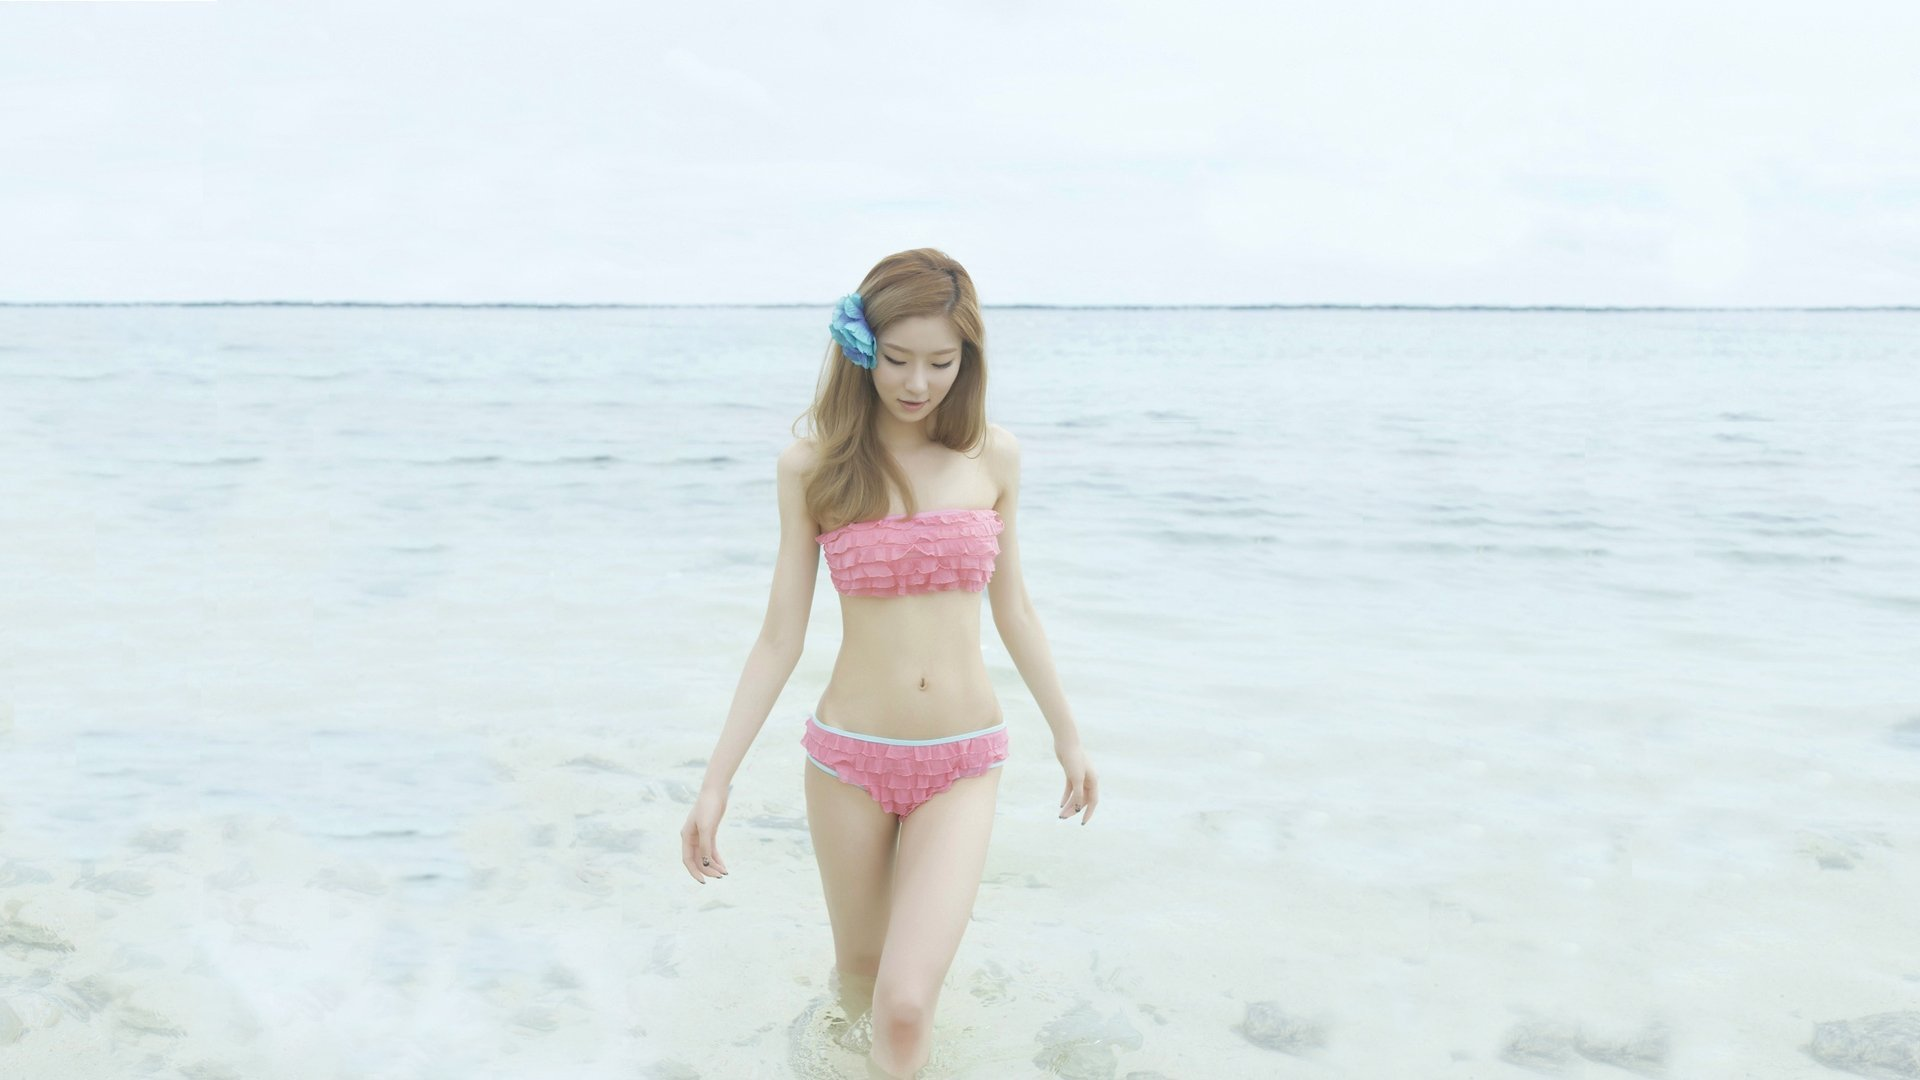 Asian yuki jin mini bathing suit - 4 3